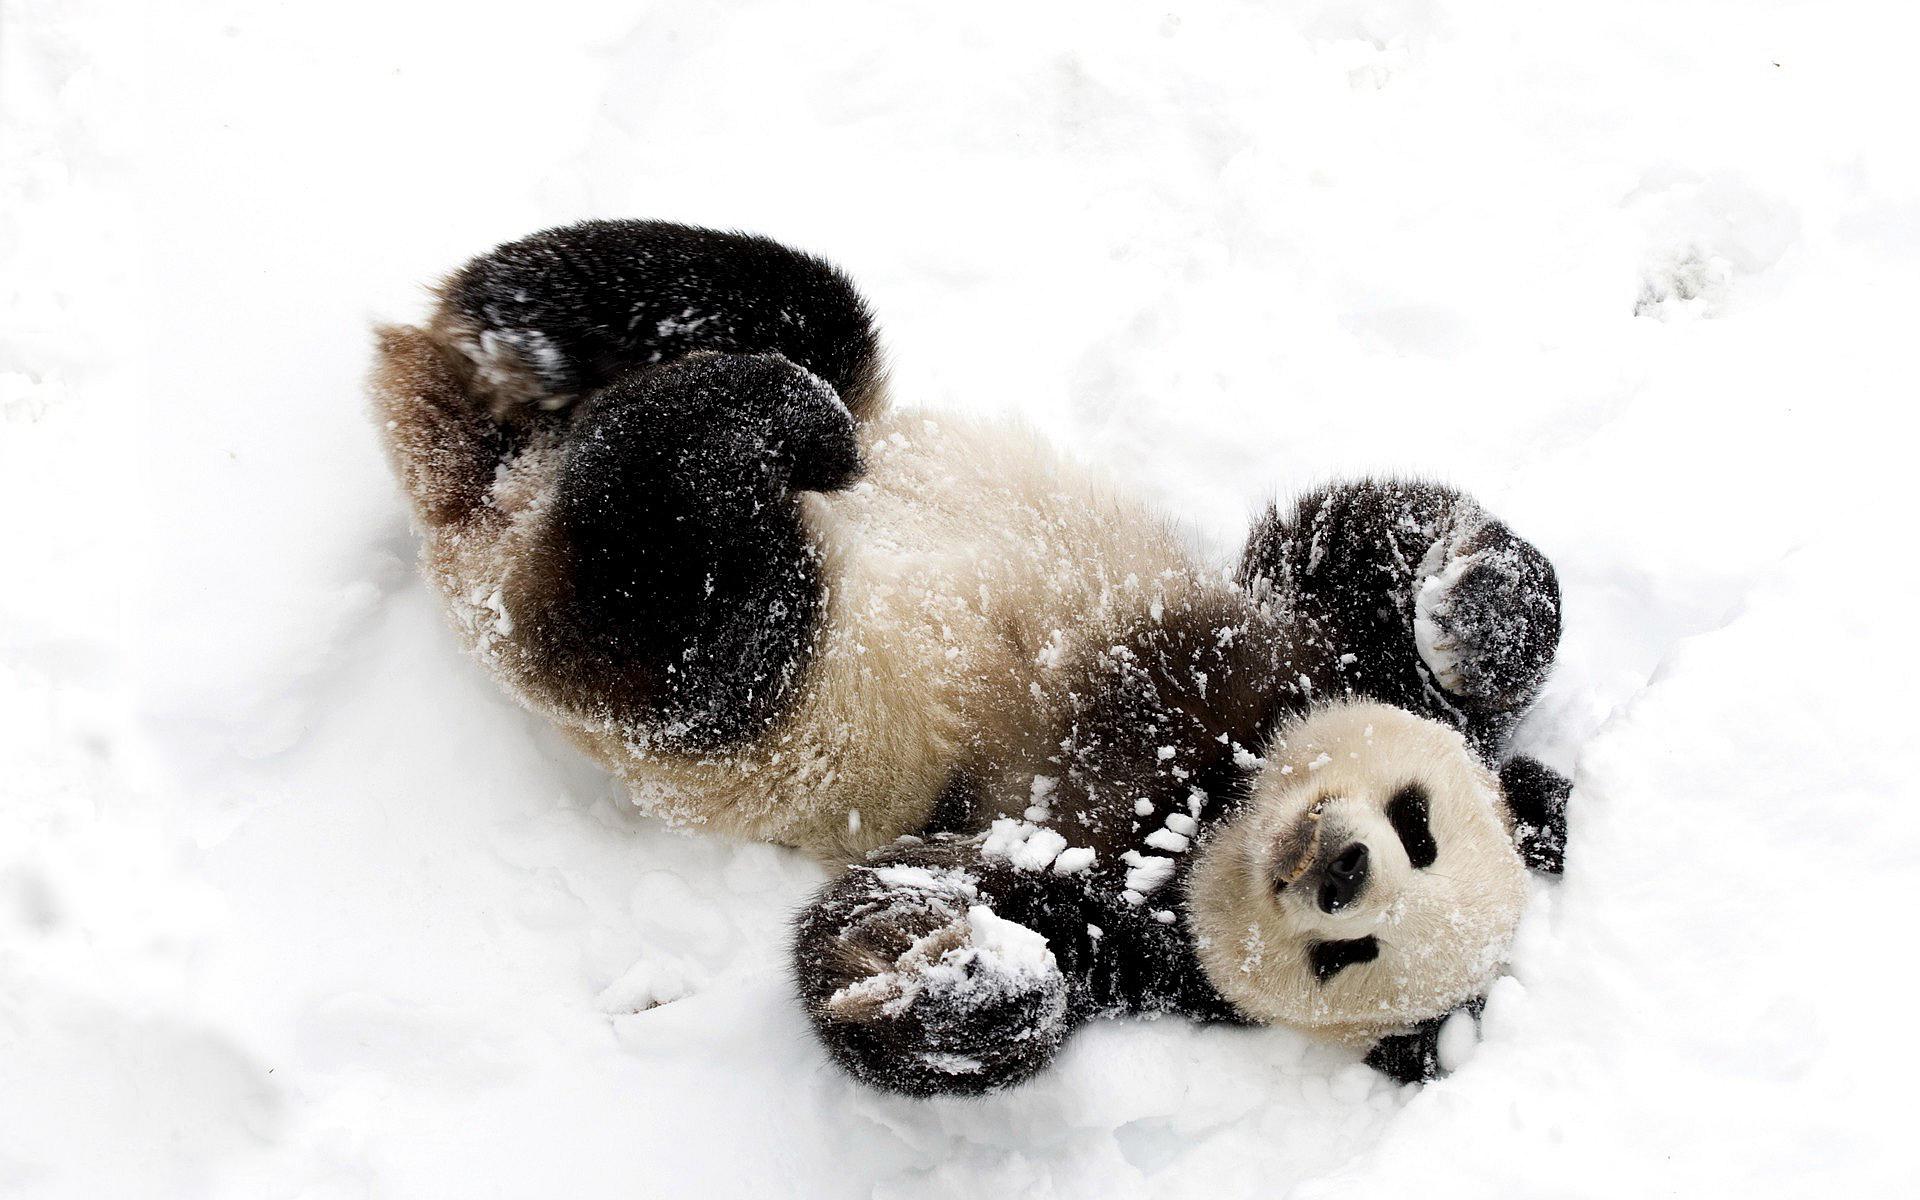 Hd Cute Panda Wallpaper Snow Animal Hd Desktop Wallpapers 4k Hd